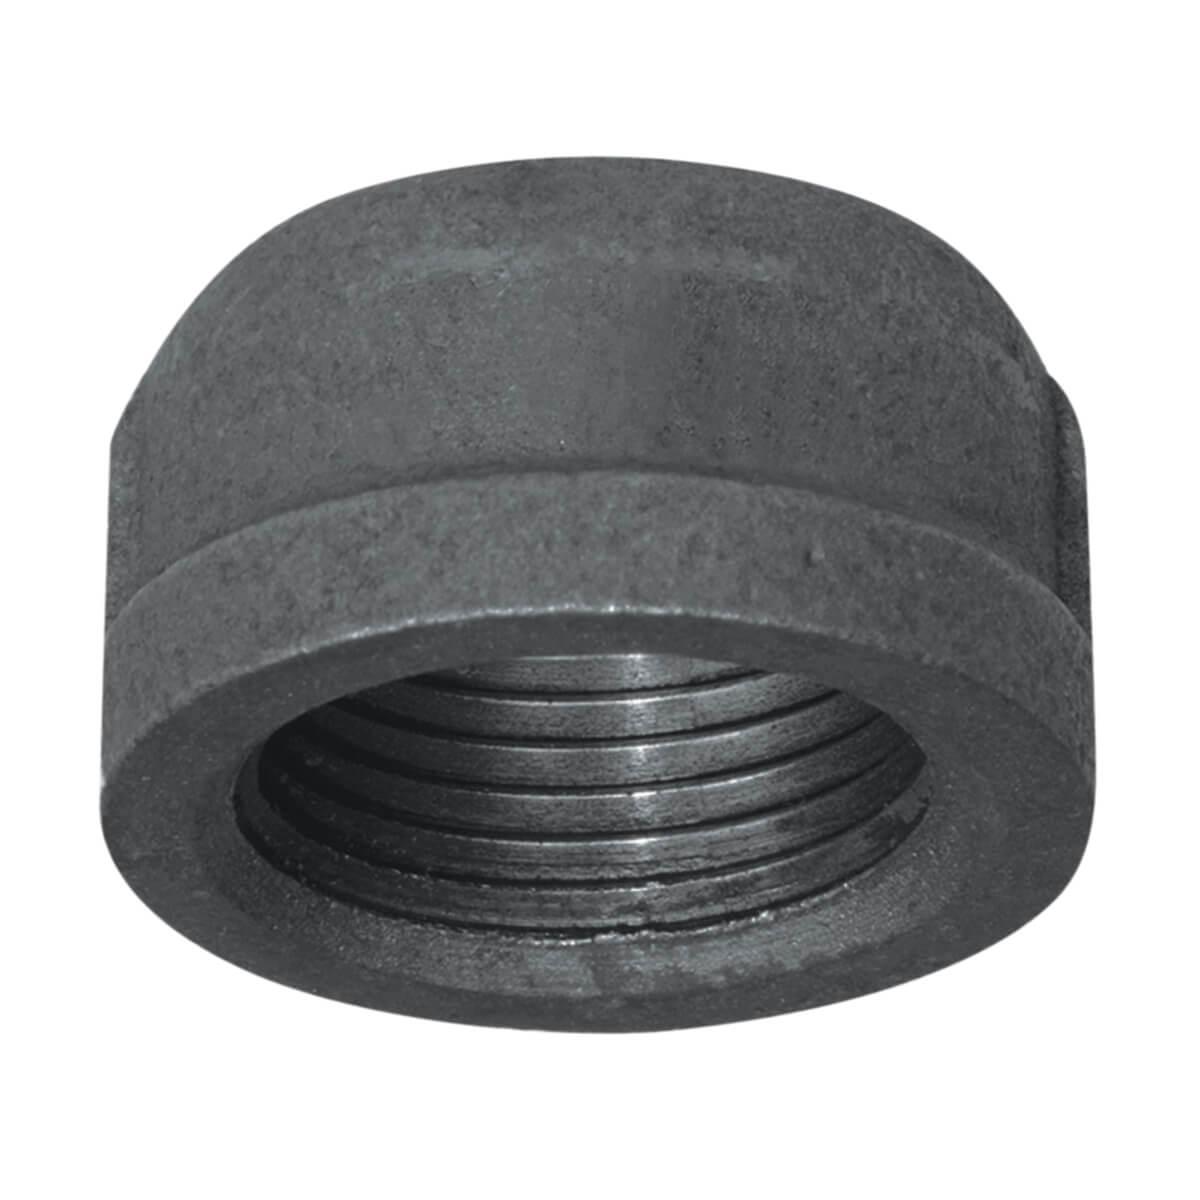 Fitting Black Iron Cap - 1-1/4-in